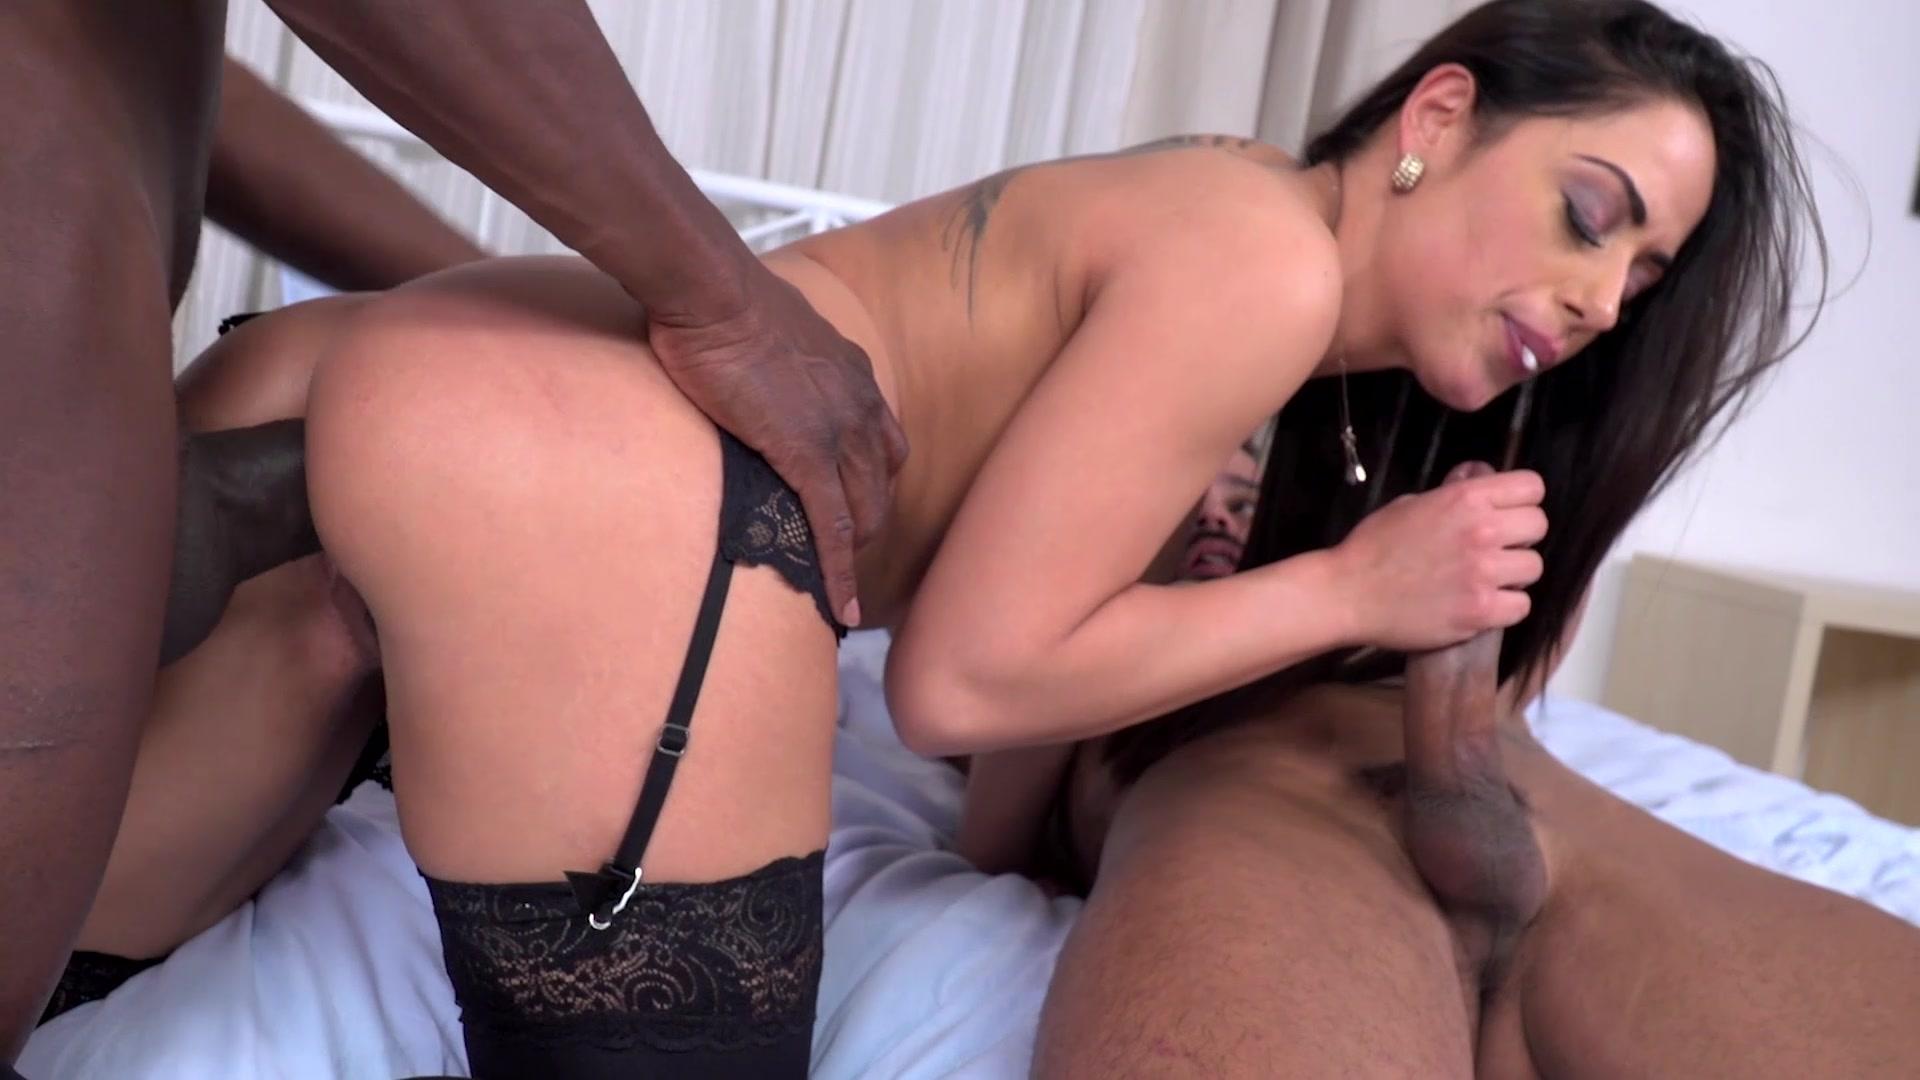 Angelin joy wants to dicks at same time 5